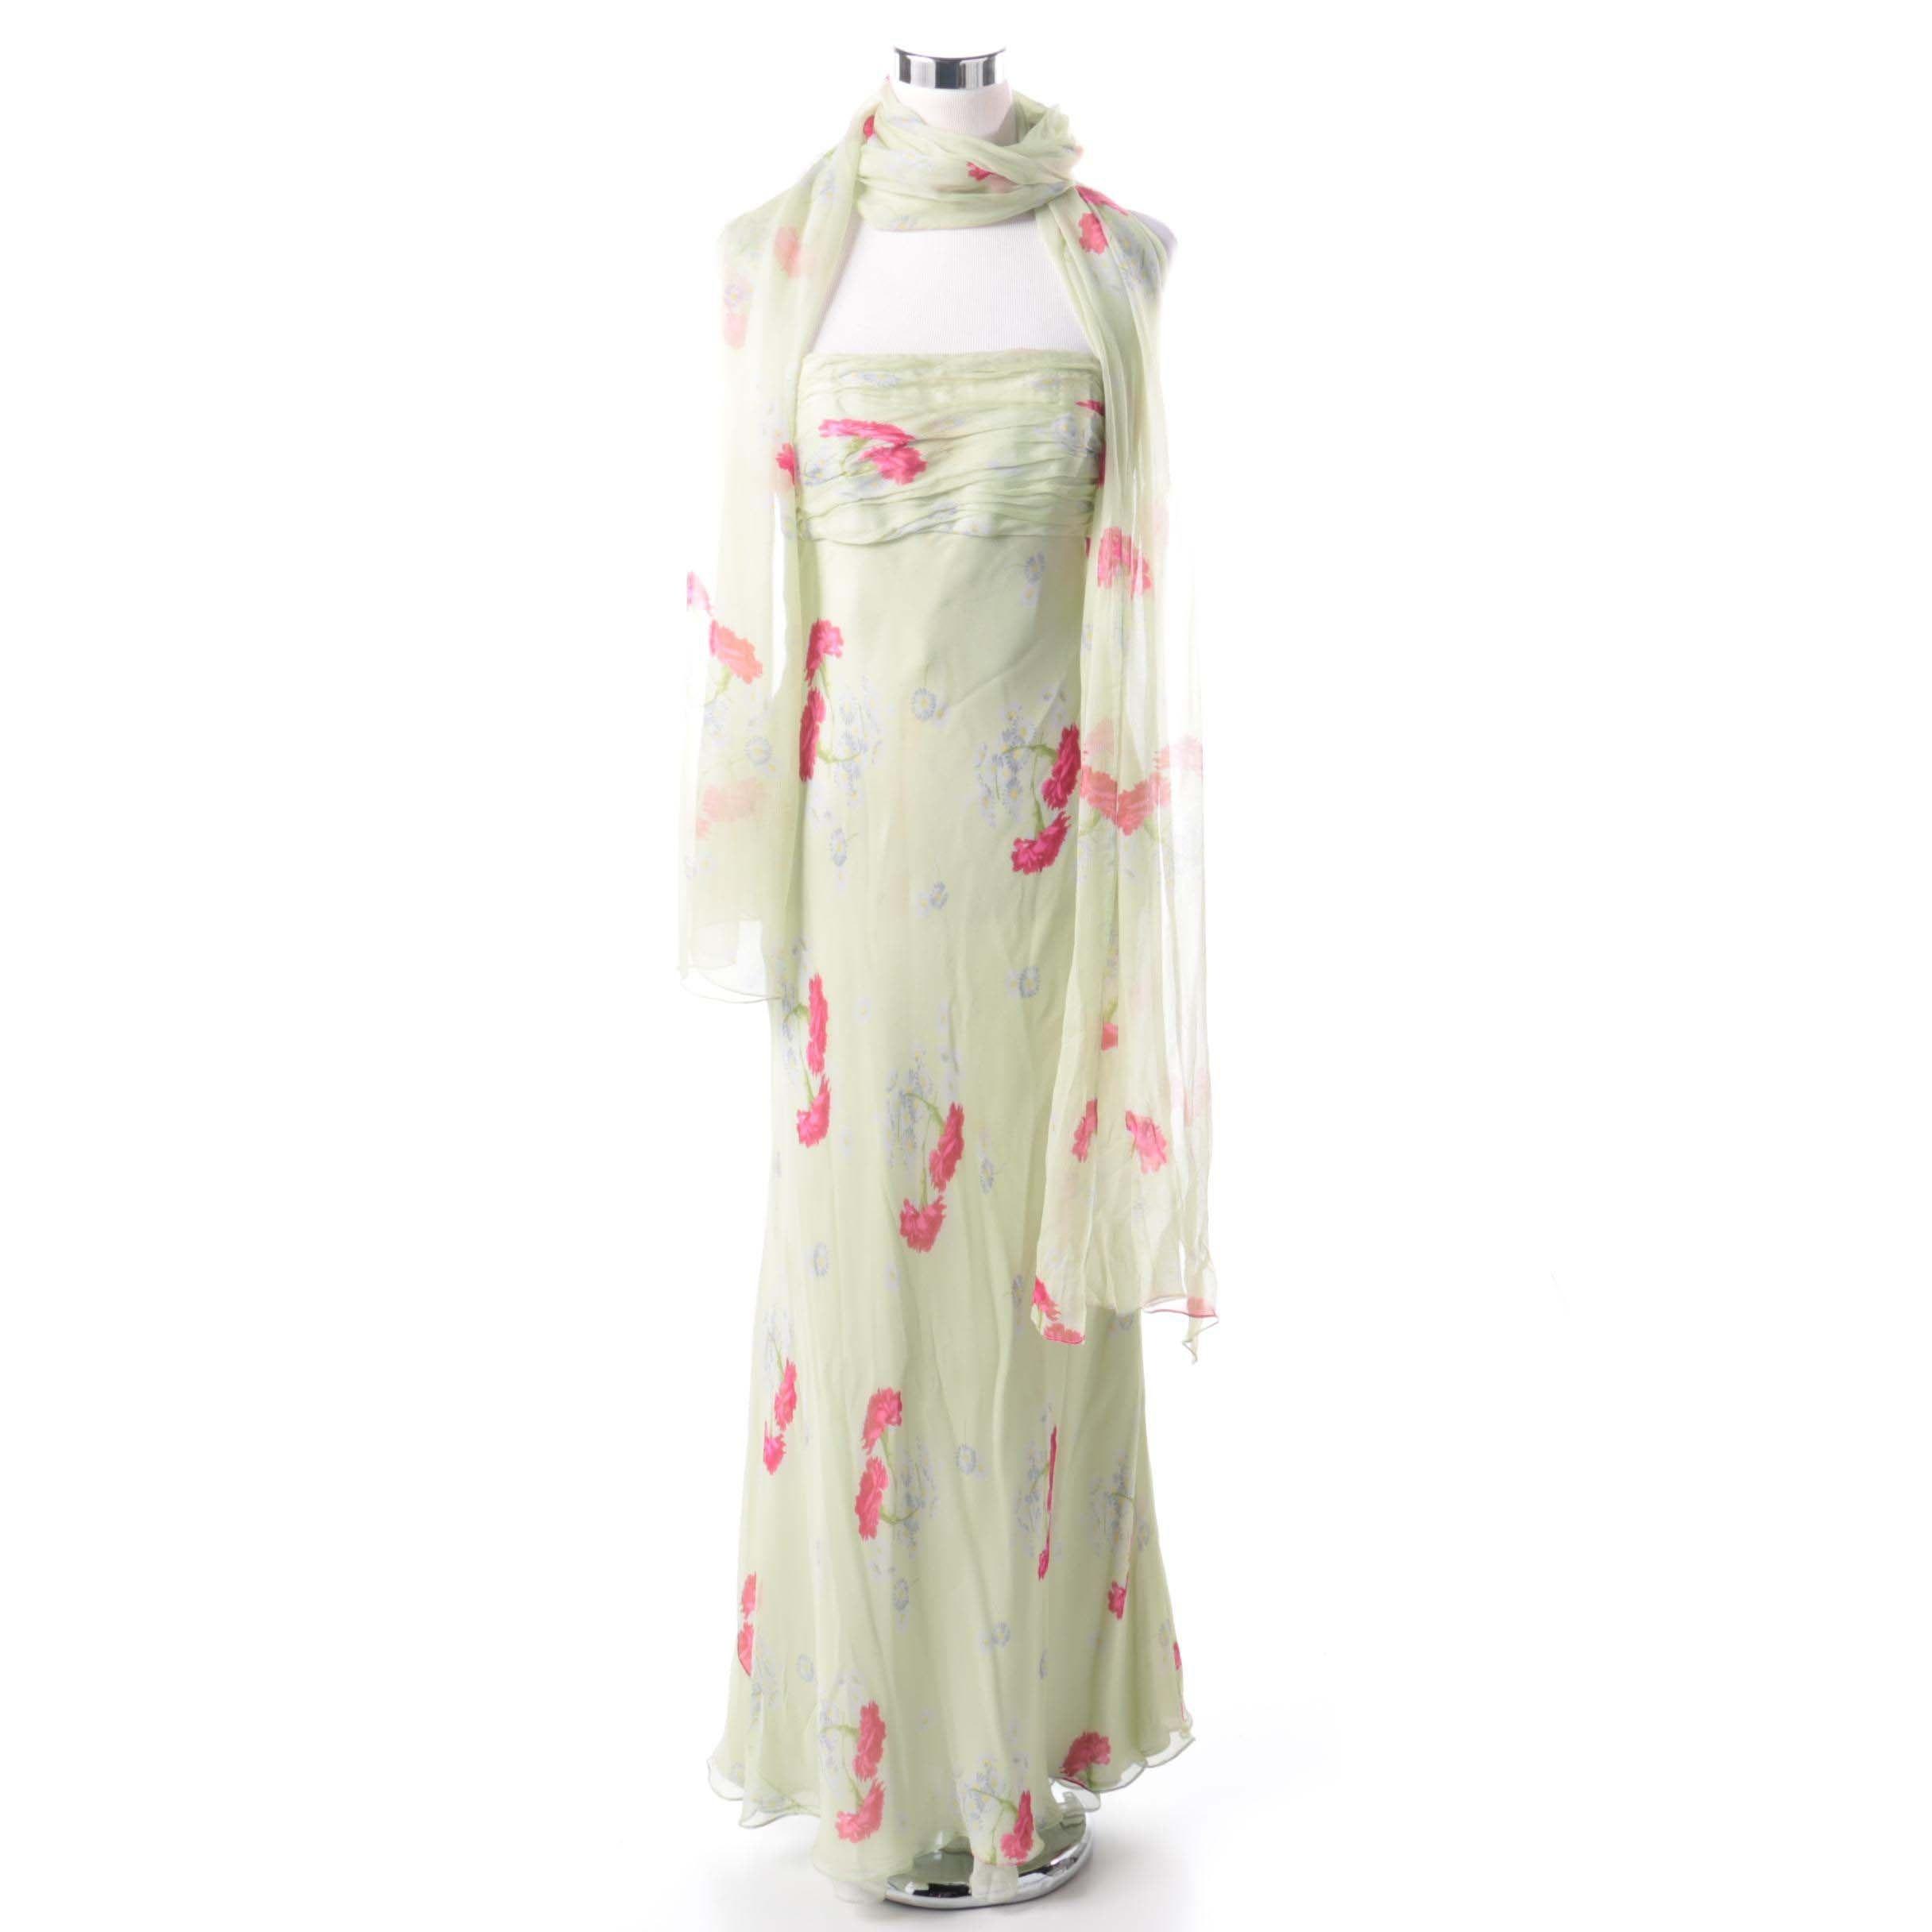 Tom and Linda Platt Floral Dress